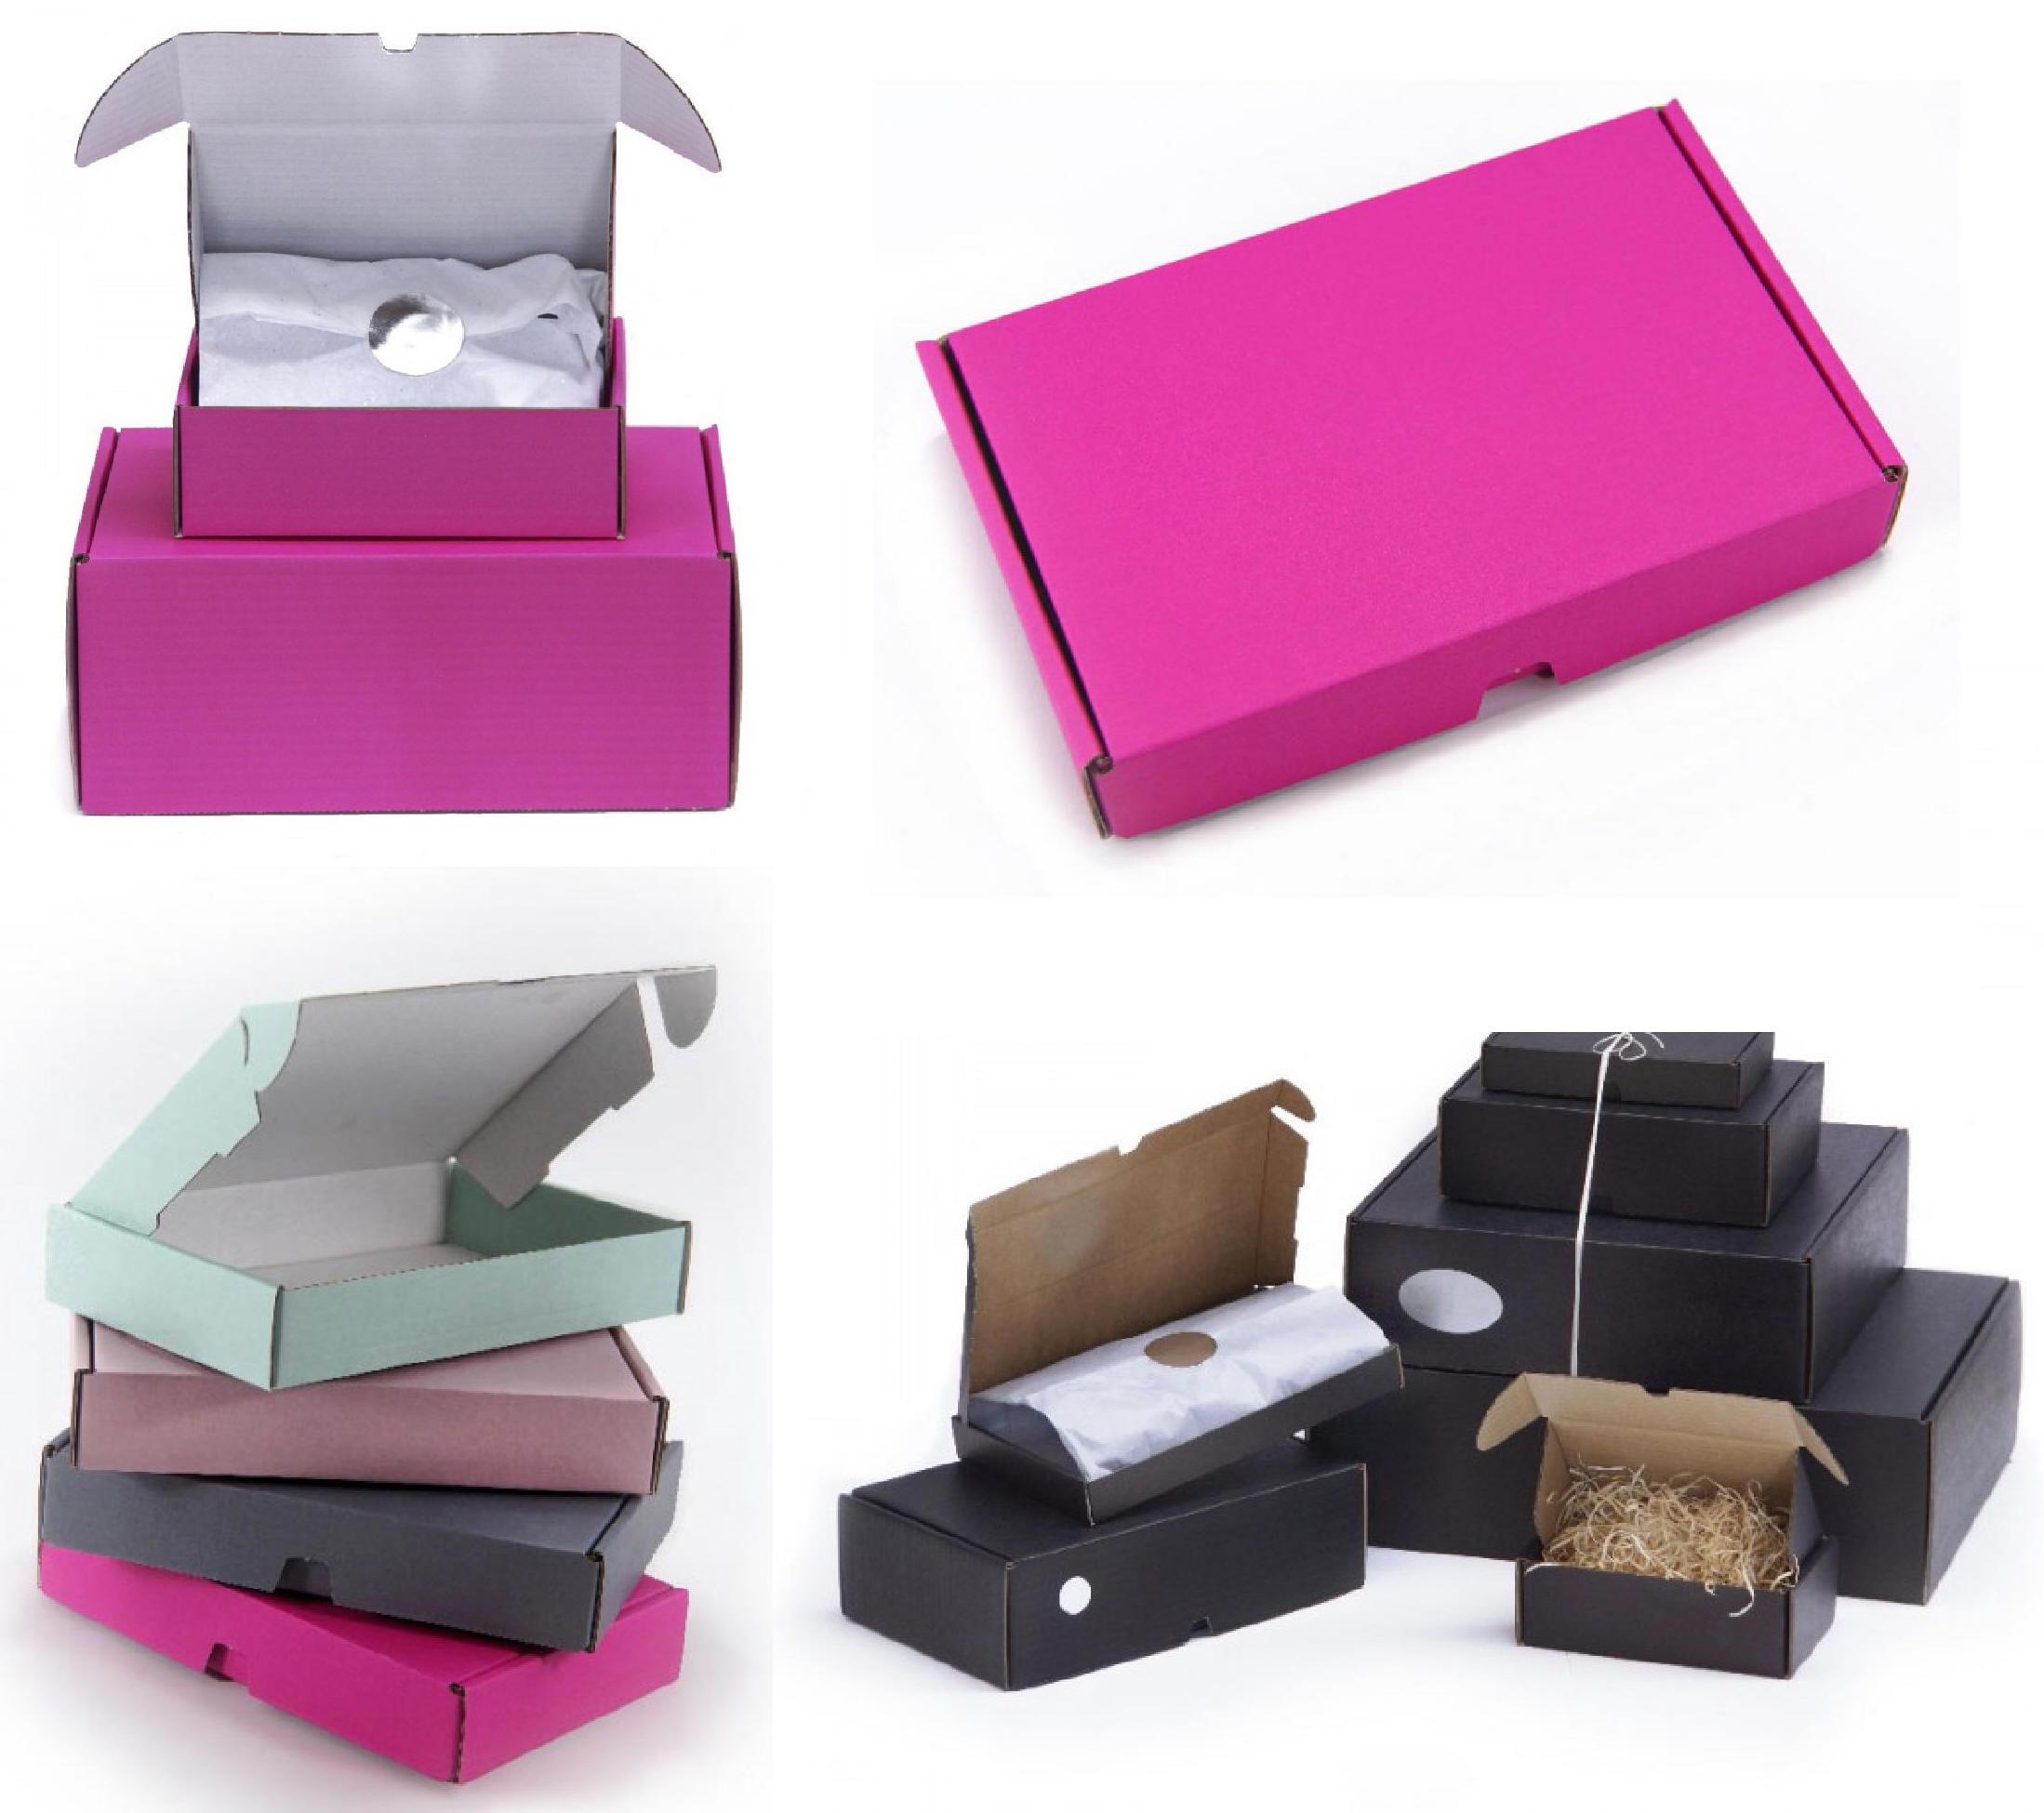 variocolors naturpak pr sentiert farbige kartons. Black Bedroom Furniture Sets. Home Design Ideas